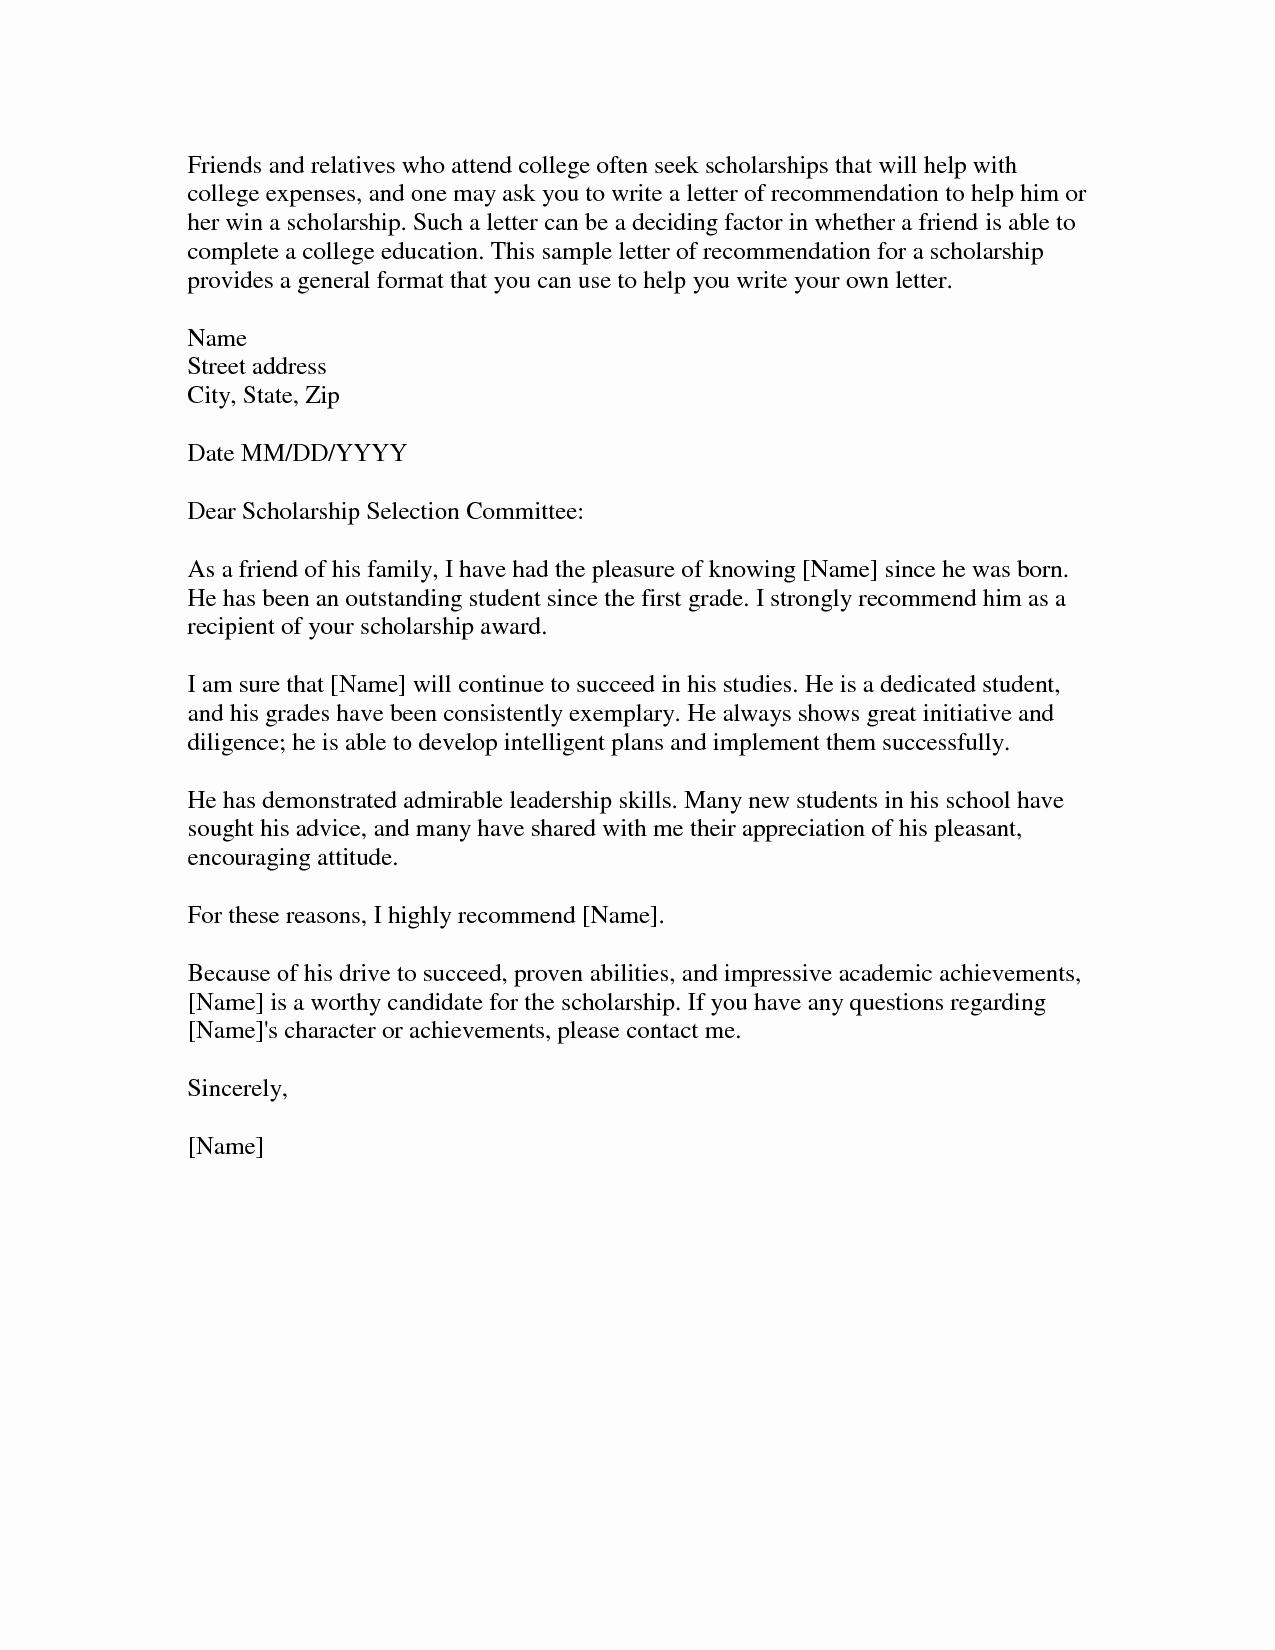 Scholarships Recommendation Letter Sample Inspirational Download Scholarship Re Mendation Letter Sample Word